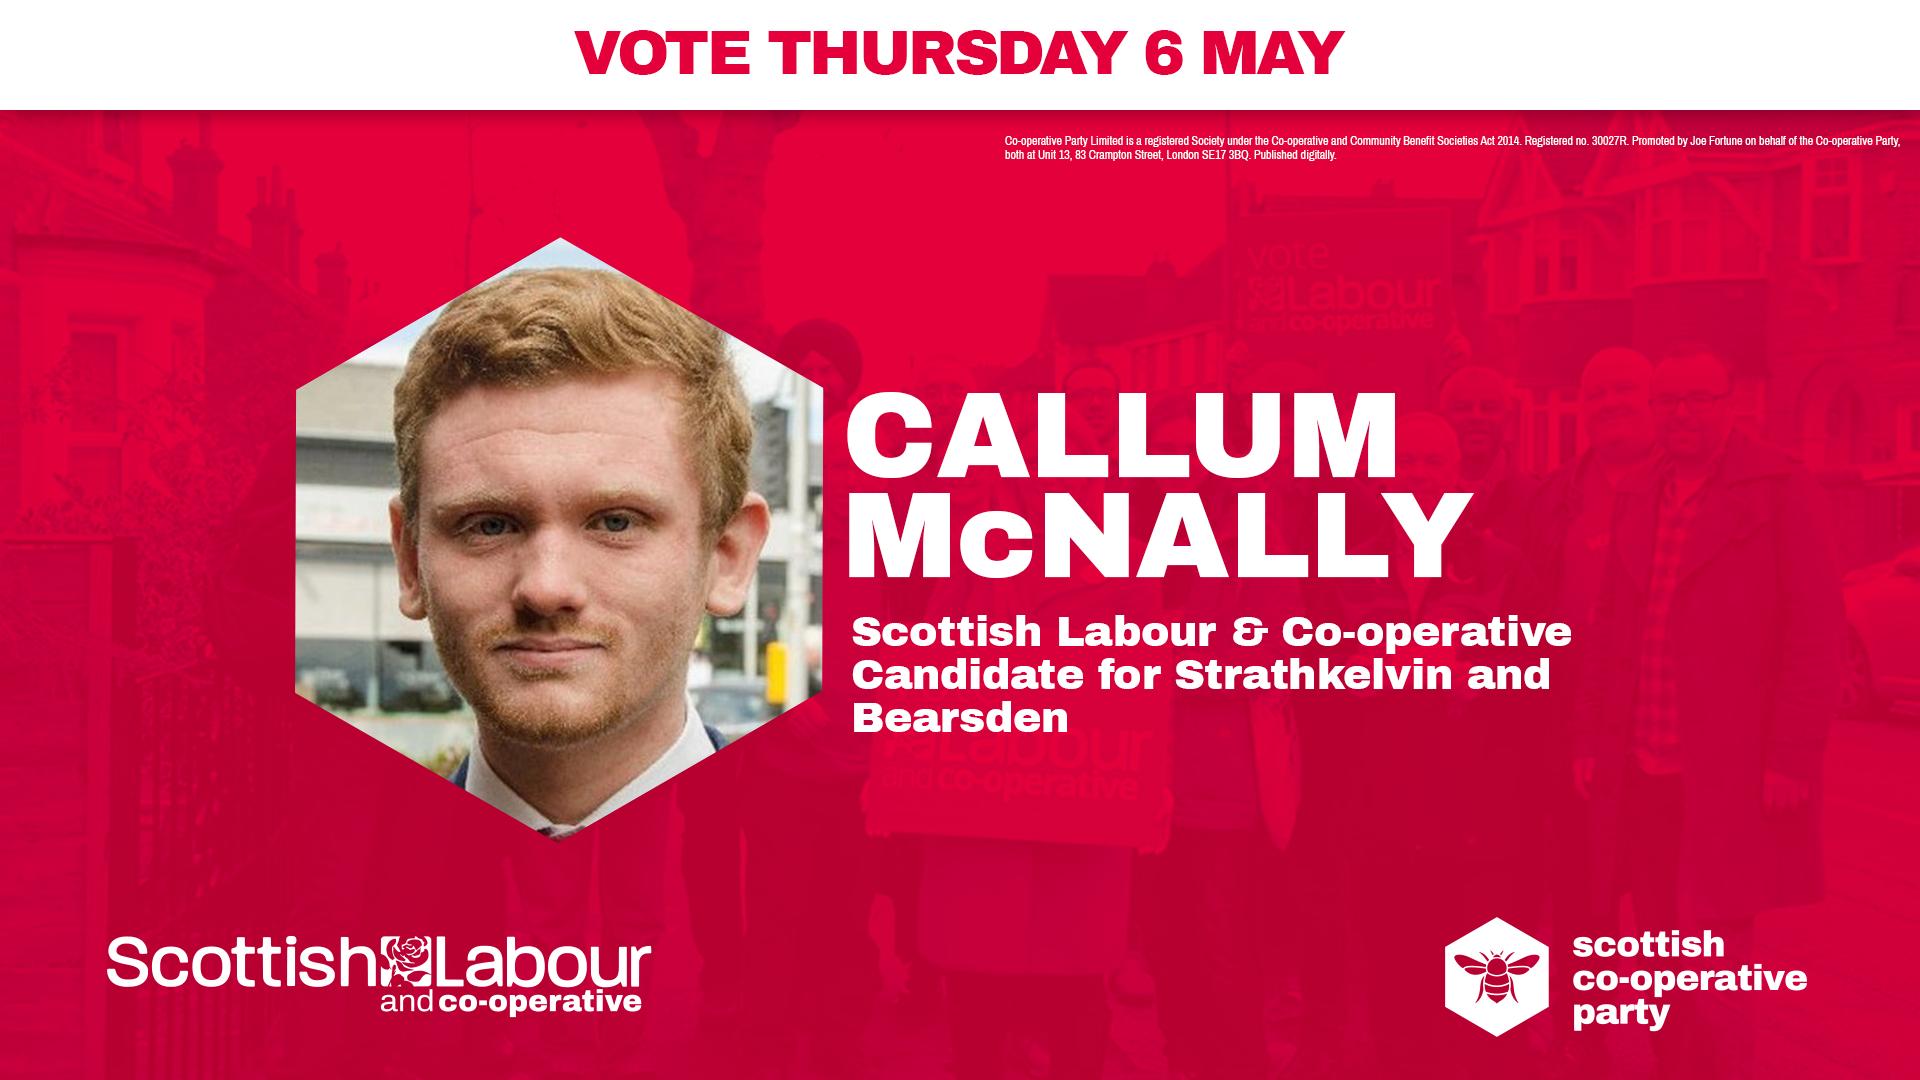 Callum McNally